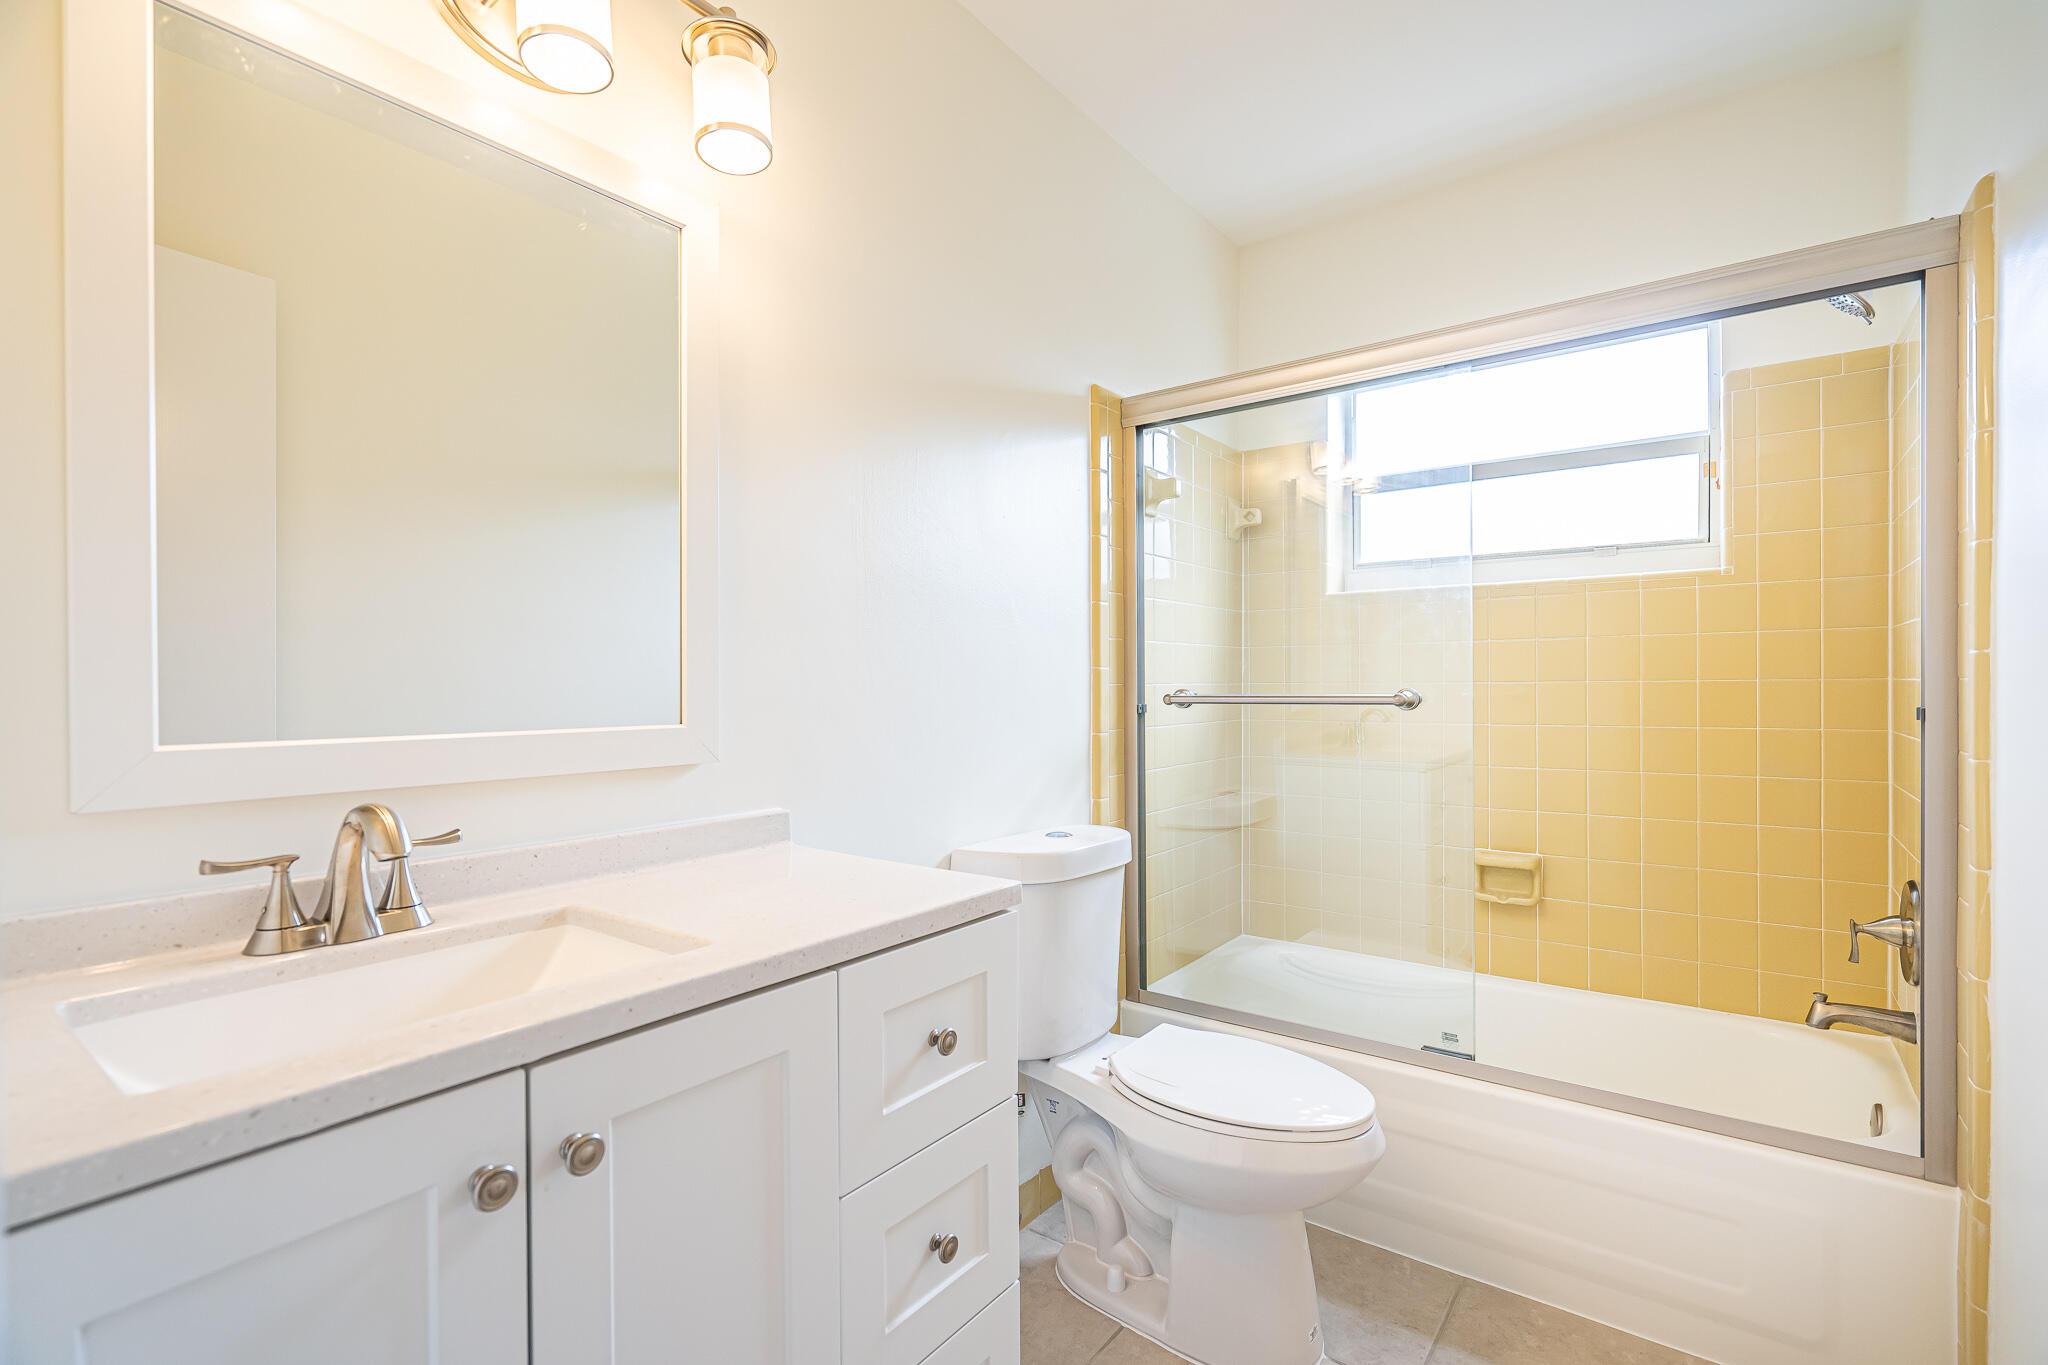 502 2nd Bathroom